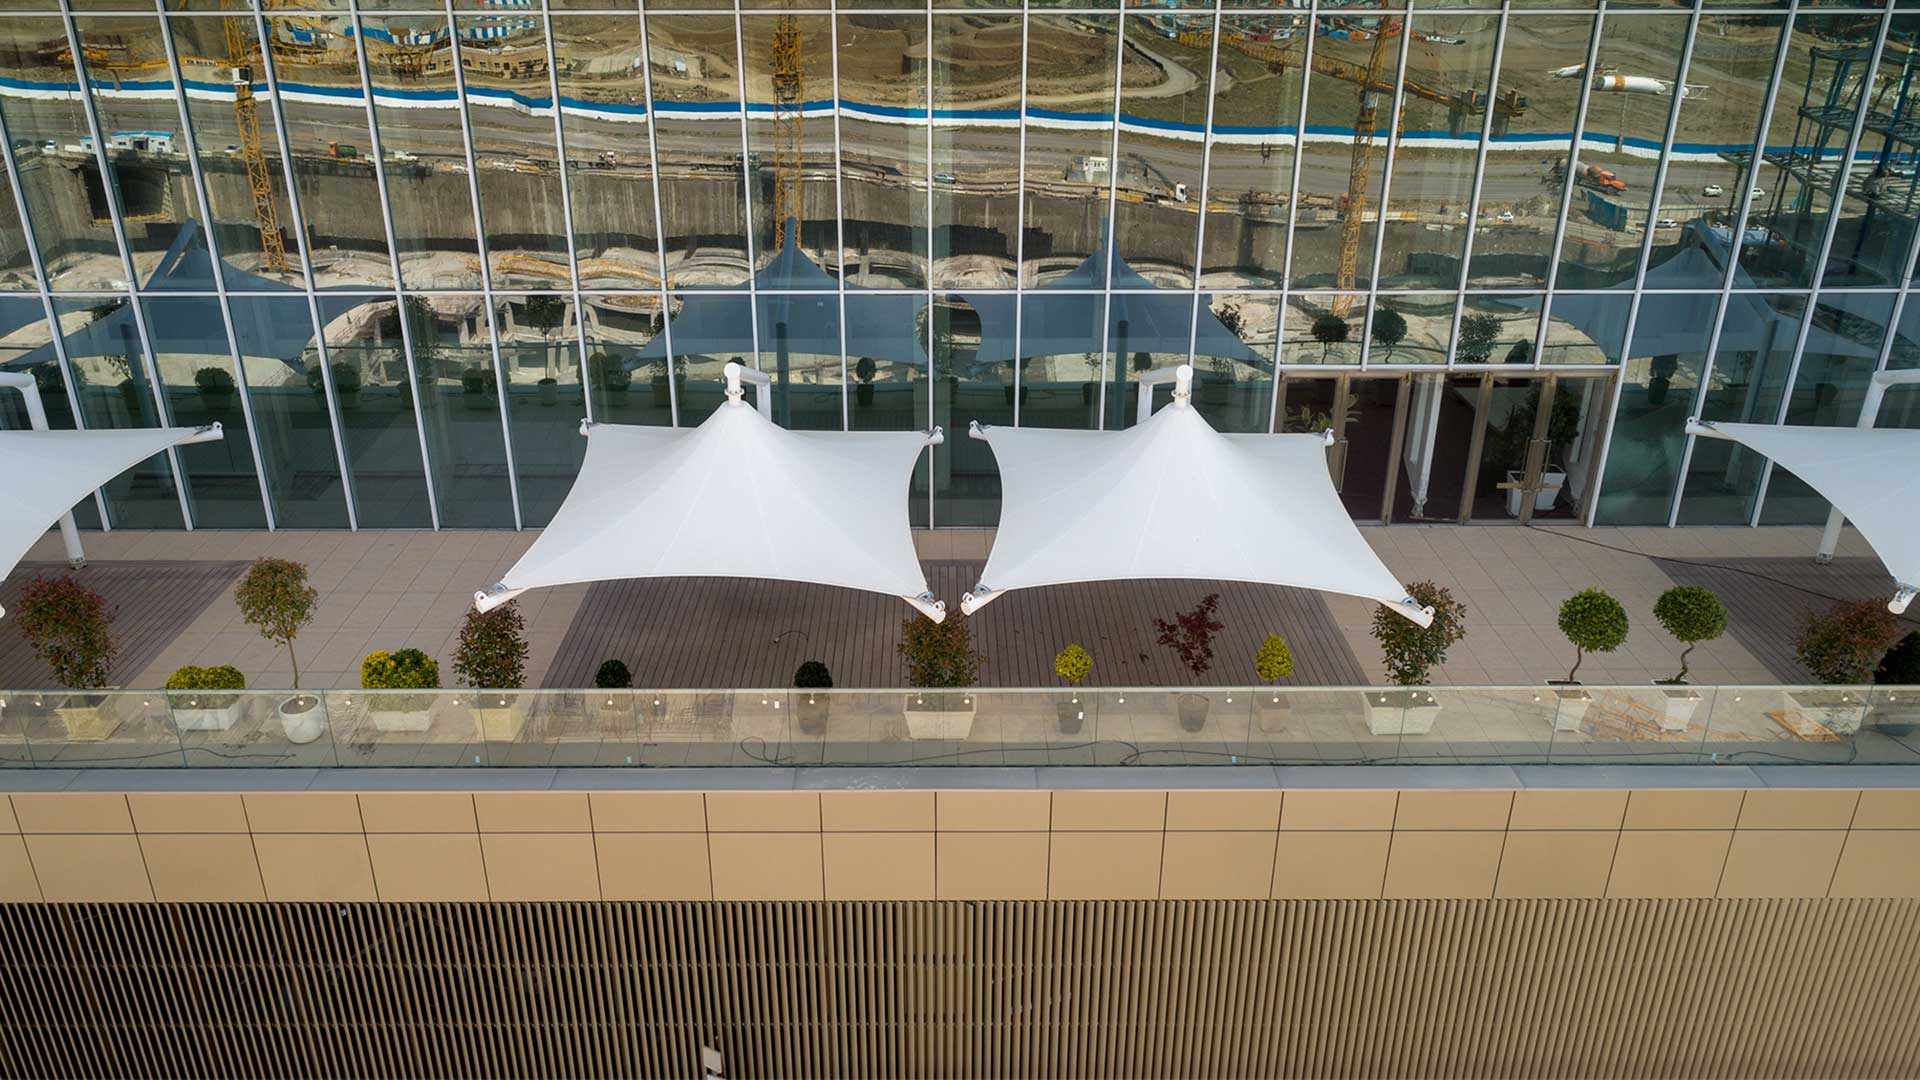 Membrane Canopies Of Iran Mall Diba Group